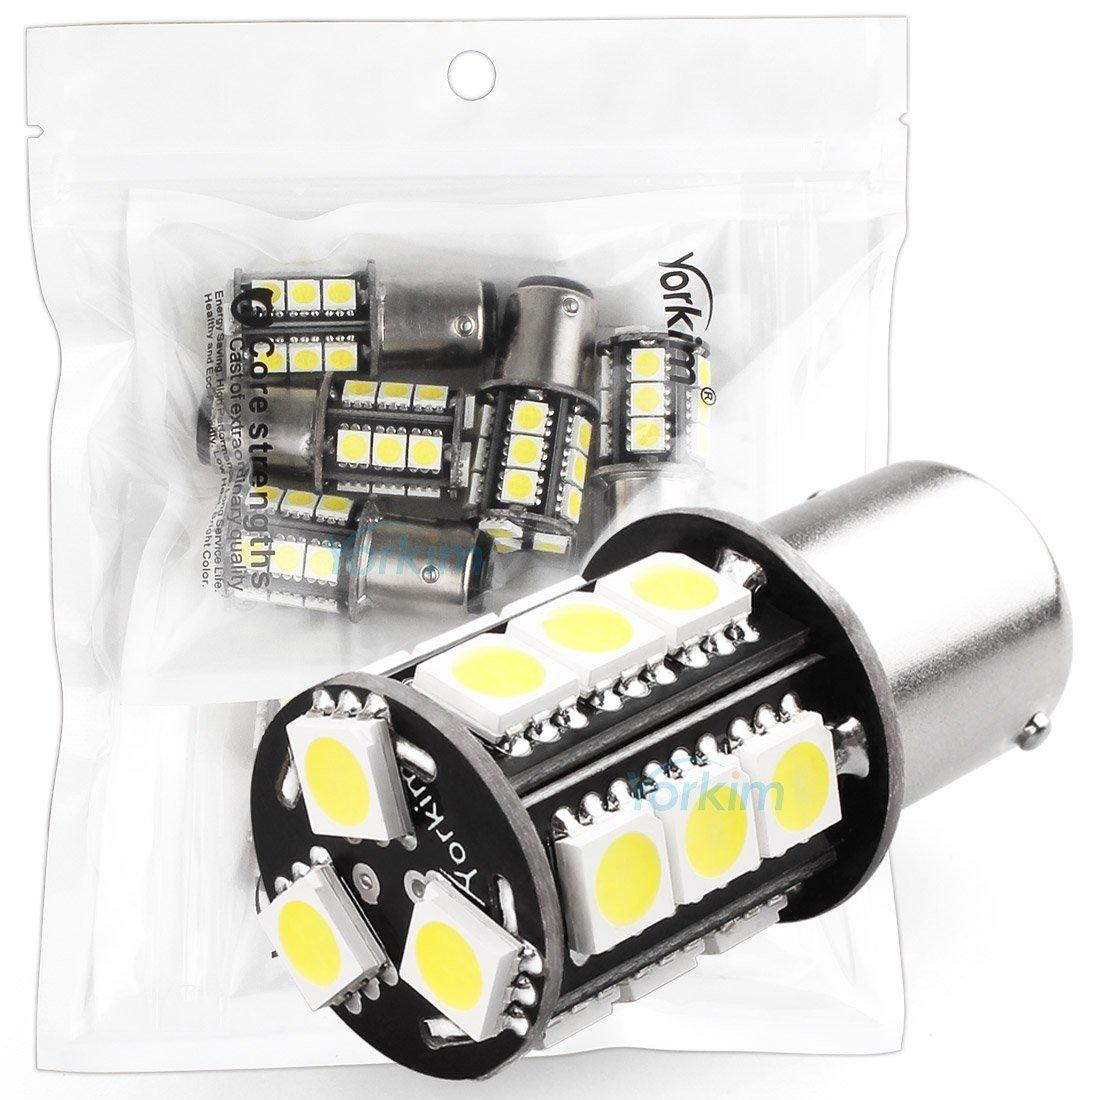 Yorkim 1157 LED Light Bulbs 18-SMD Super Bright White Lamps For LED Brake Lights, LED Tail Lights, LED Backup Reverse Lights, 2057 LED Bulb, 7528 LED Bulbs – Pack of 2